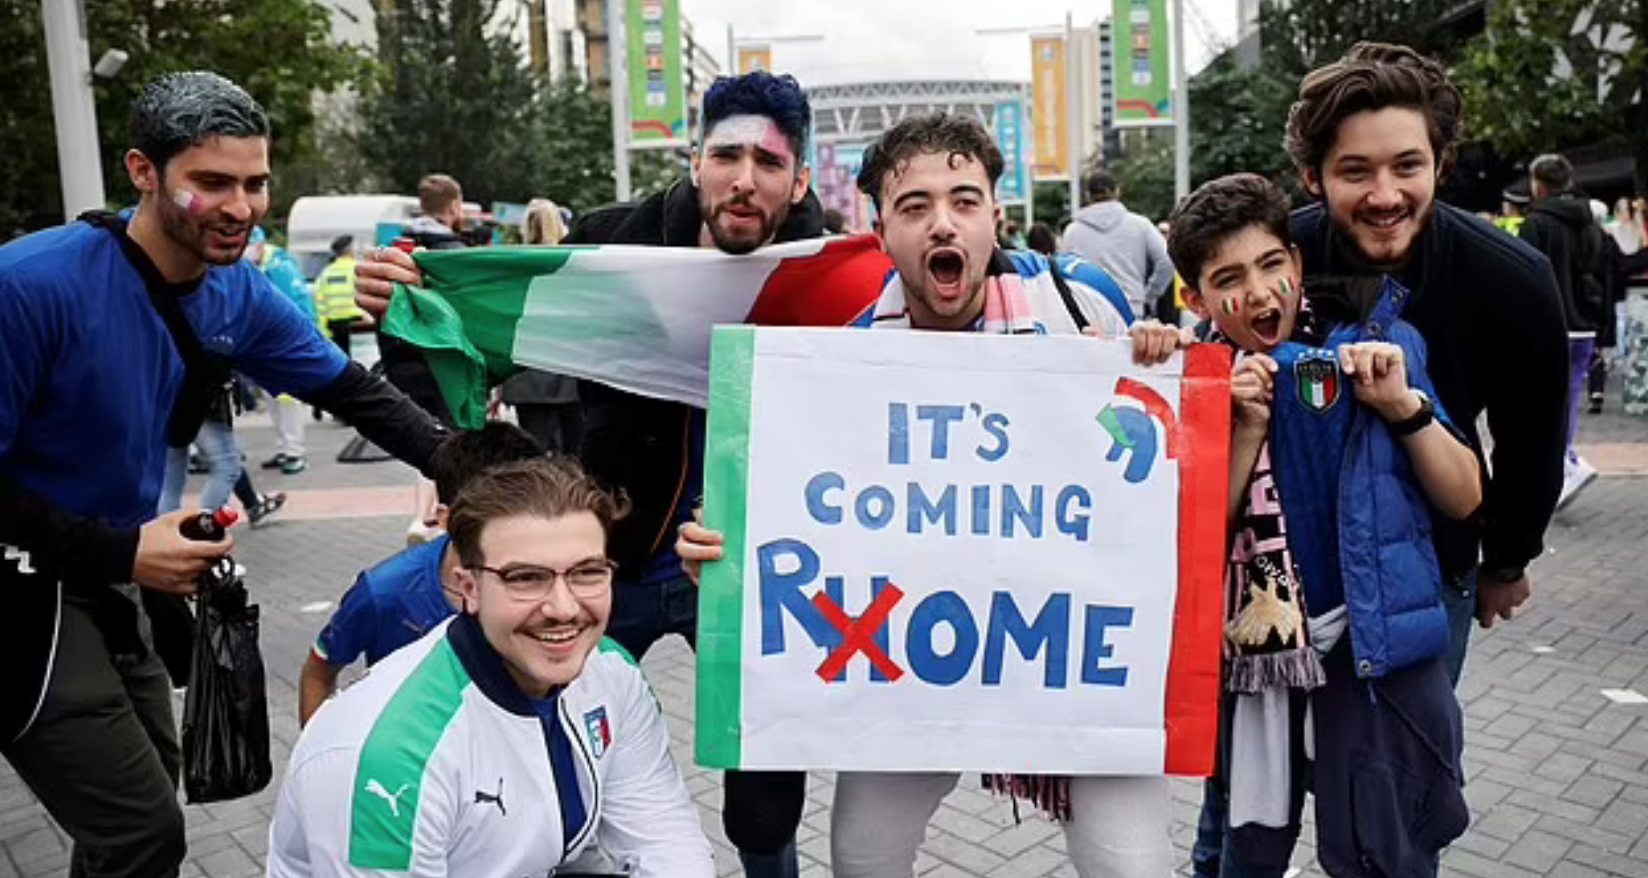 Wartawan Italia: Sepak bola sedang menyelam di rumah - 1